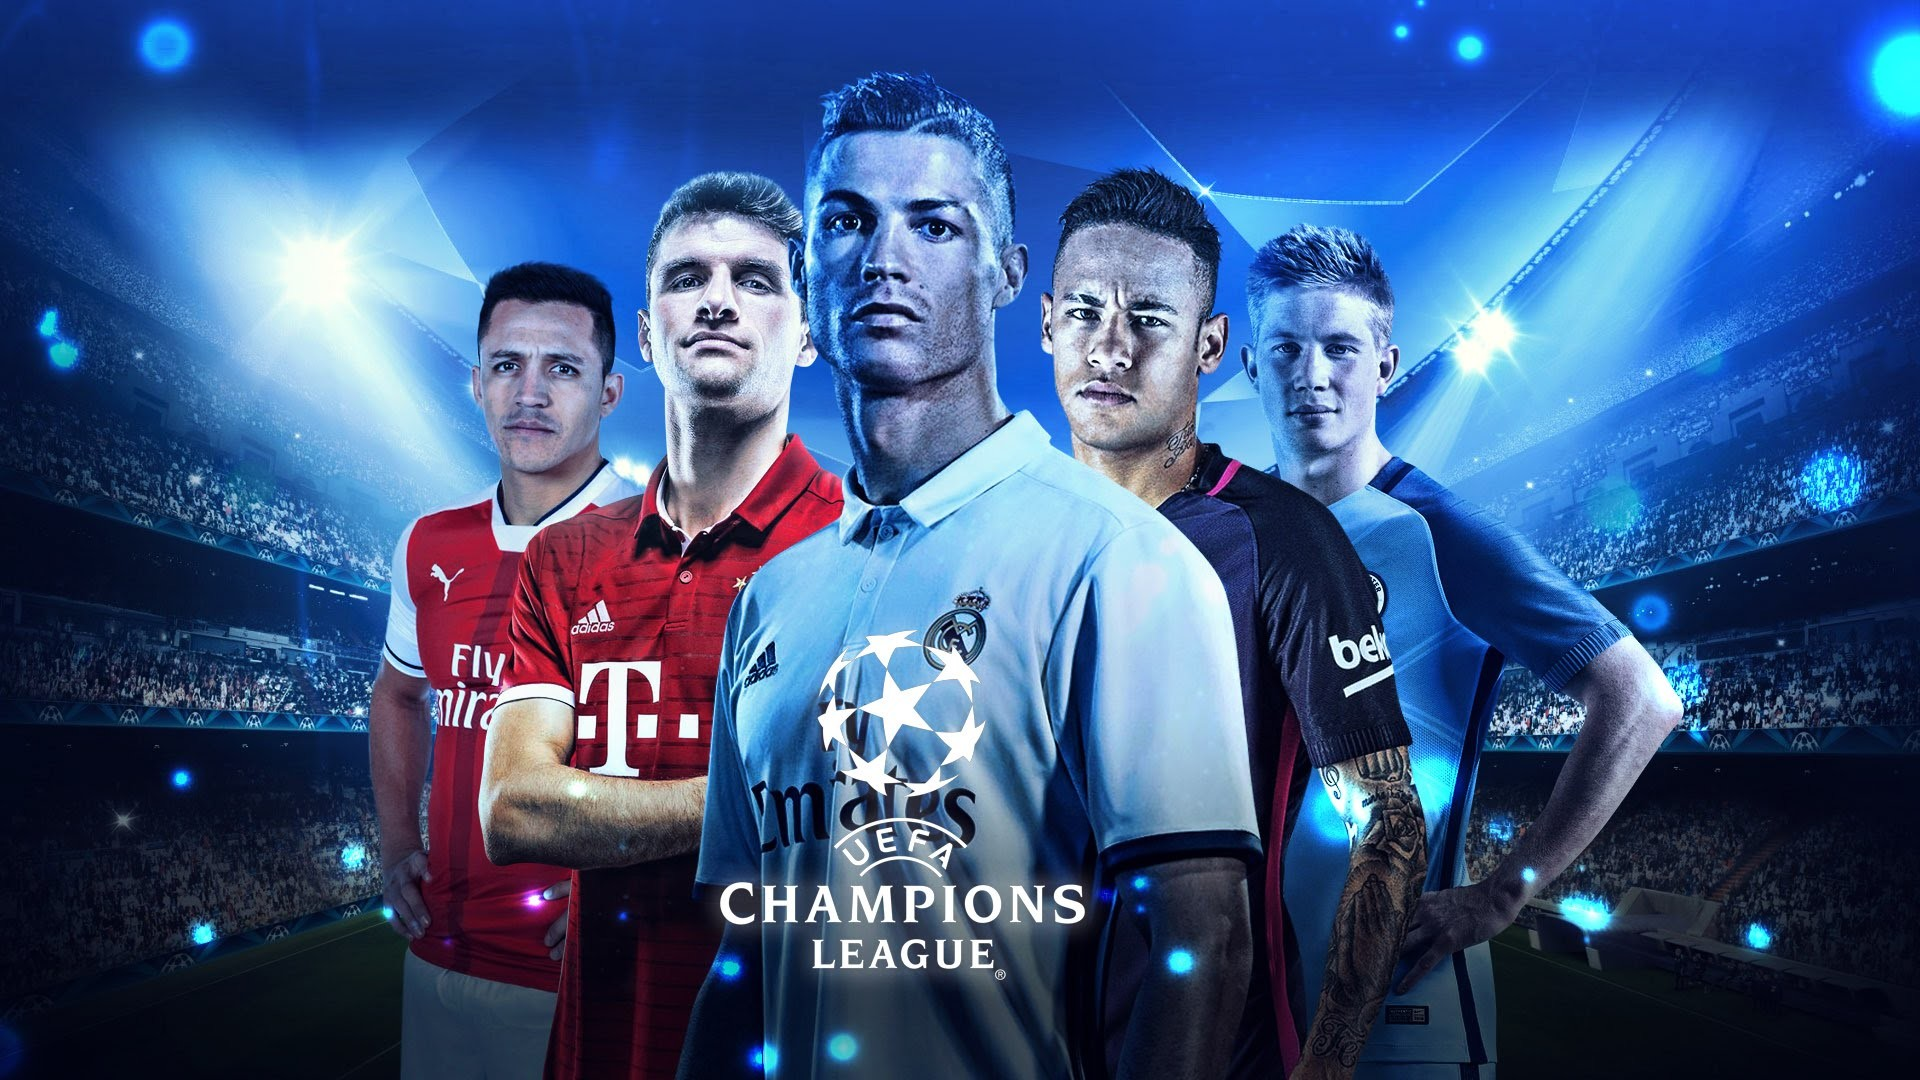 uefa champions league wallpaper hd  72  images